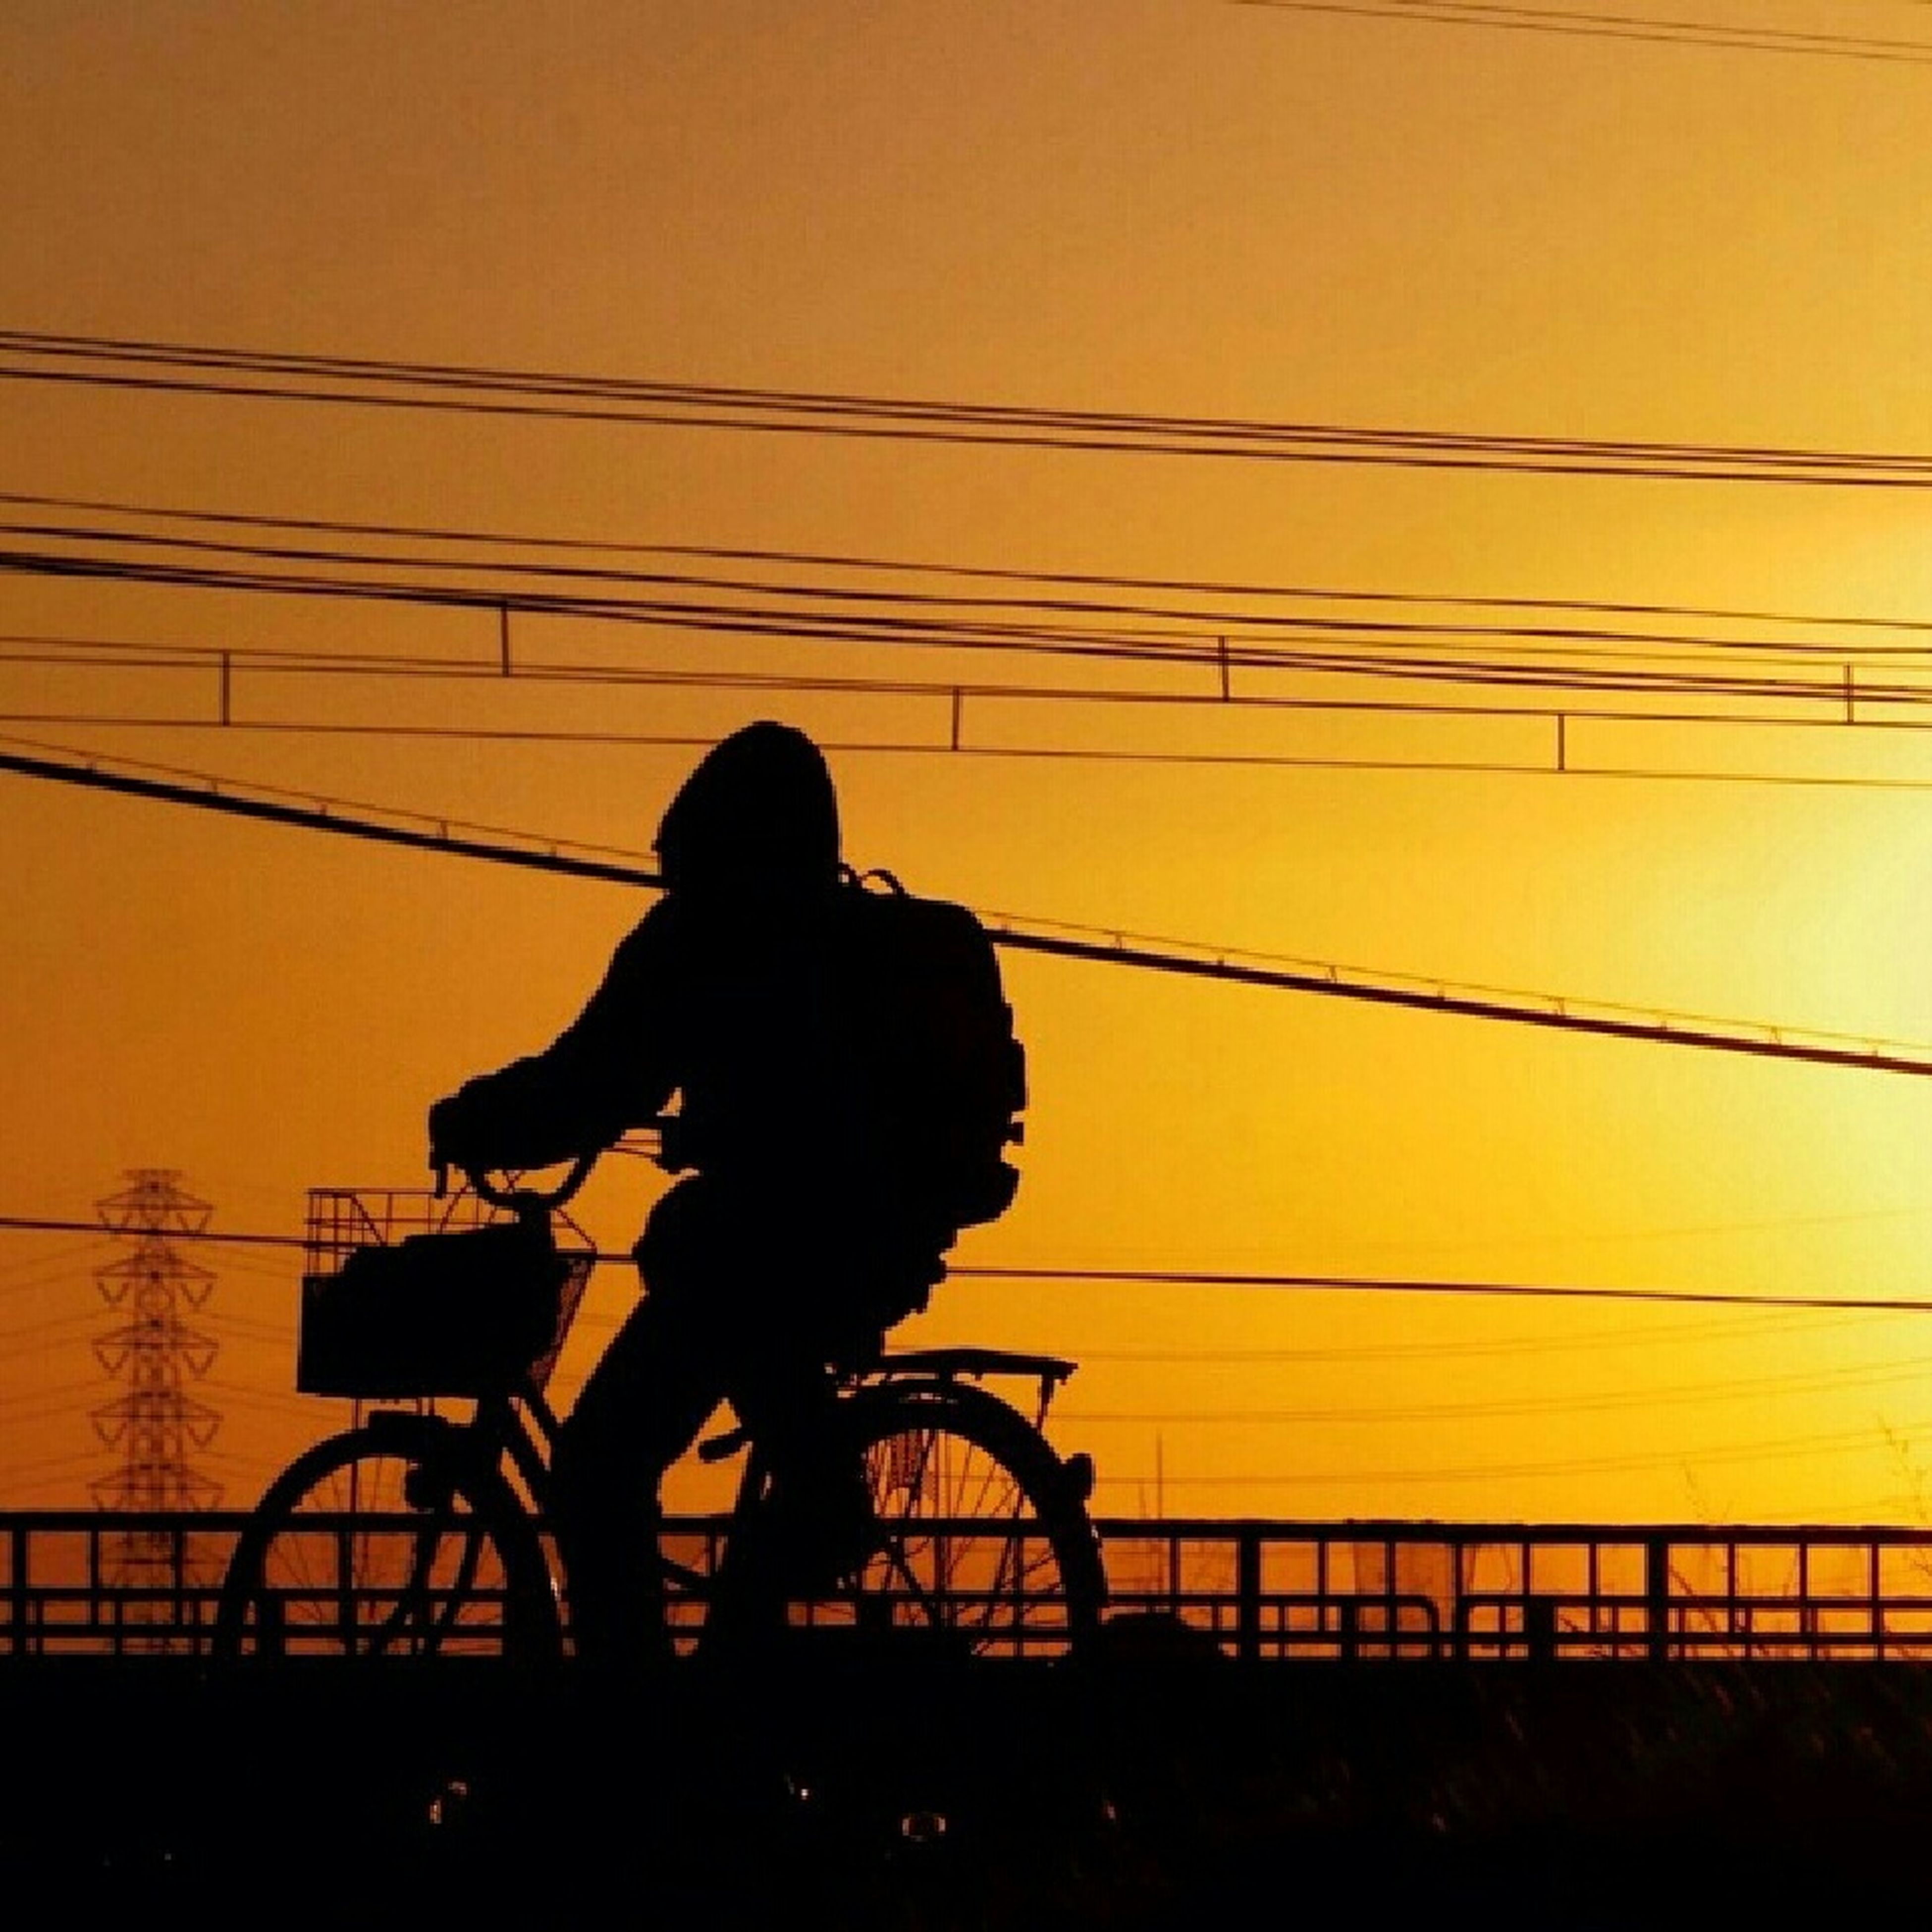 silhouette, sunset, lifestyles, orange color, leisure activity, men, standing, railing, connection, full length, sky, power line, rear view, cable, side view, person, electricity pylon, built structure